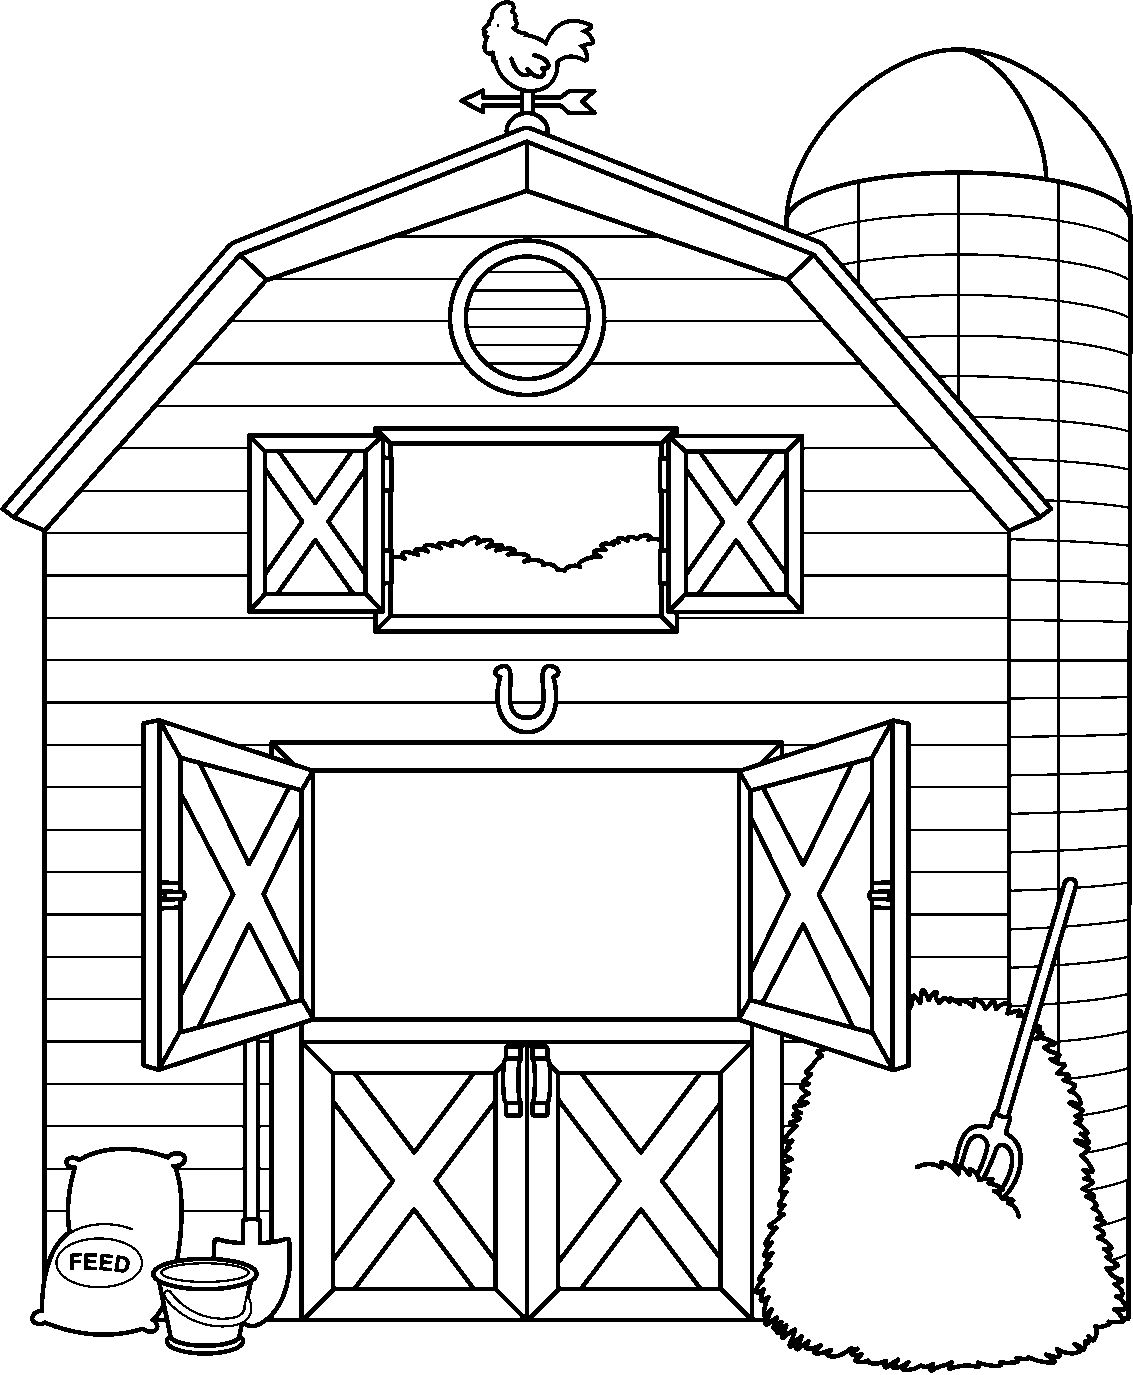 Barn Clip Art Free Barn Clipart Black And White Free Clipart.